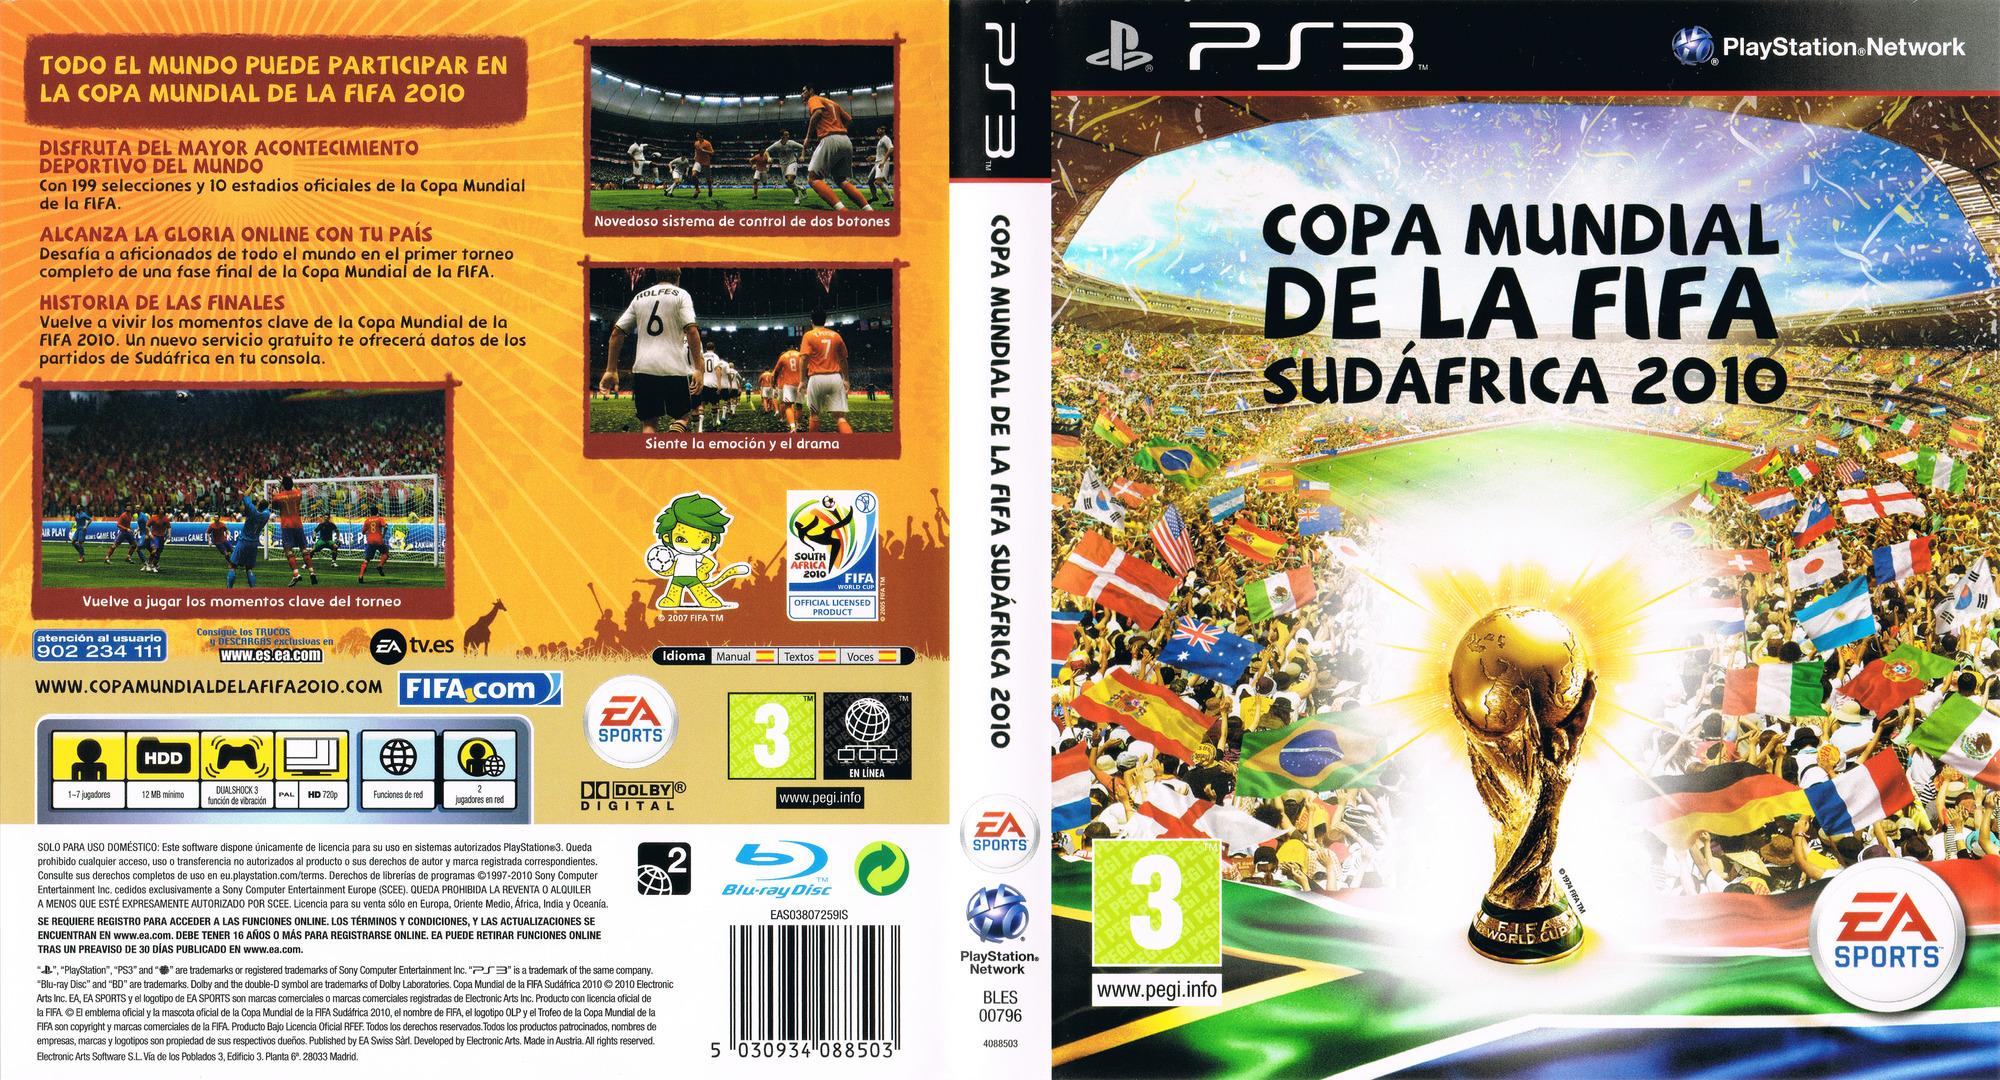 Copa Mundial de la Fifa Sudáfrica 2010 PS3 coverfullHQ (BLES00796)